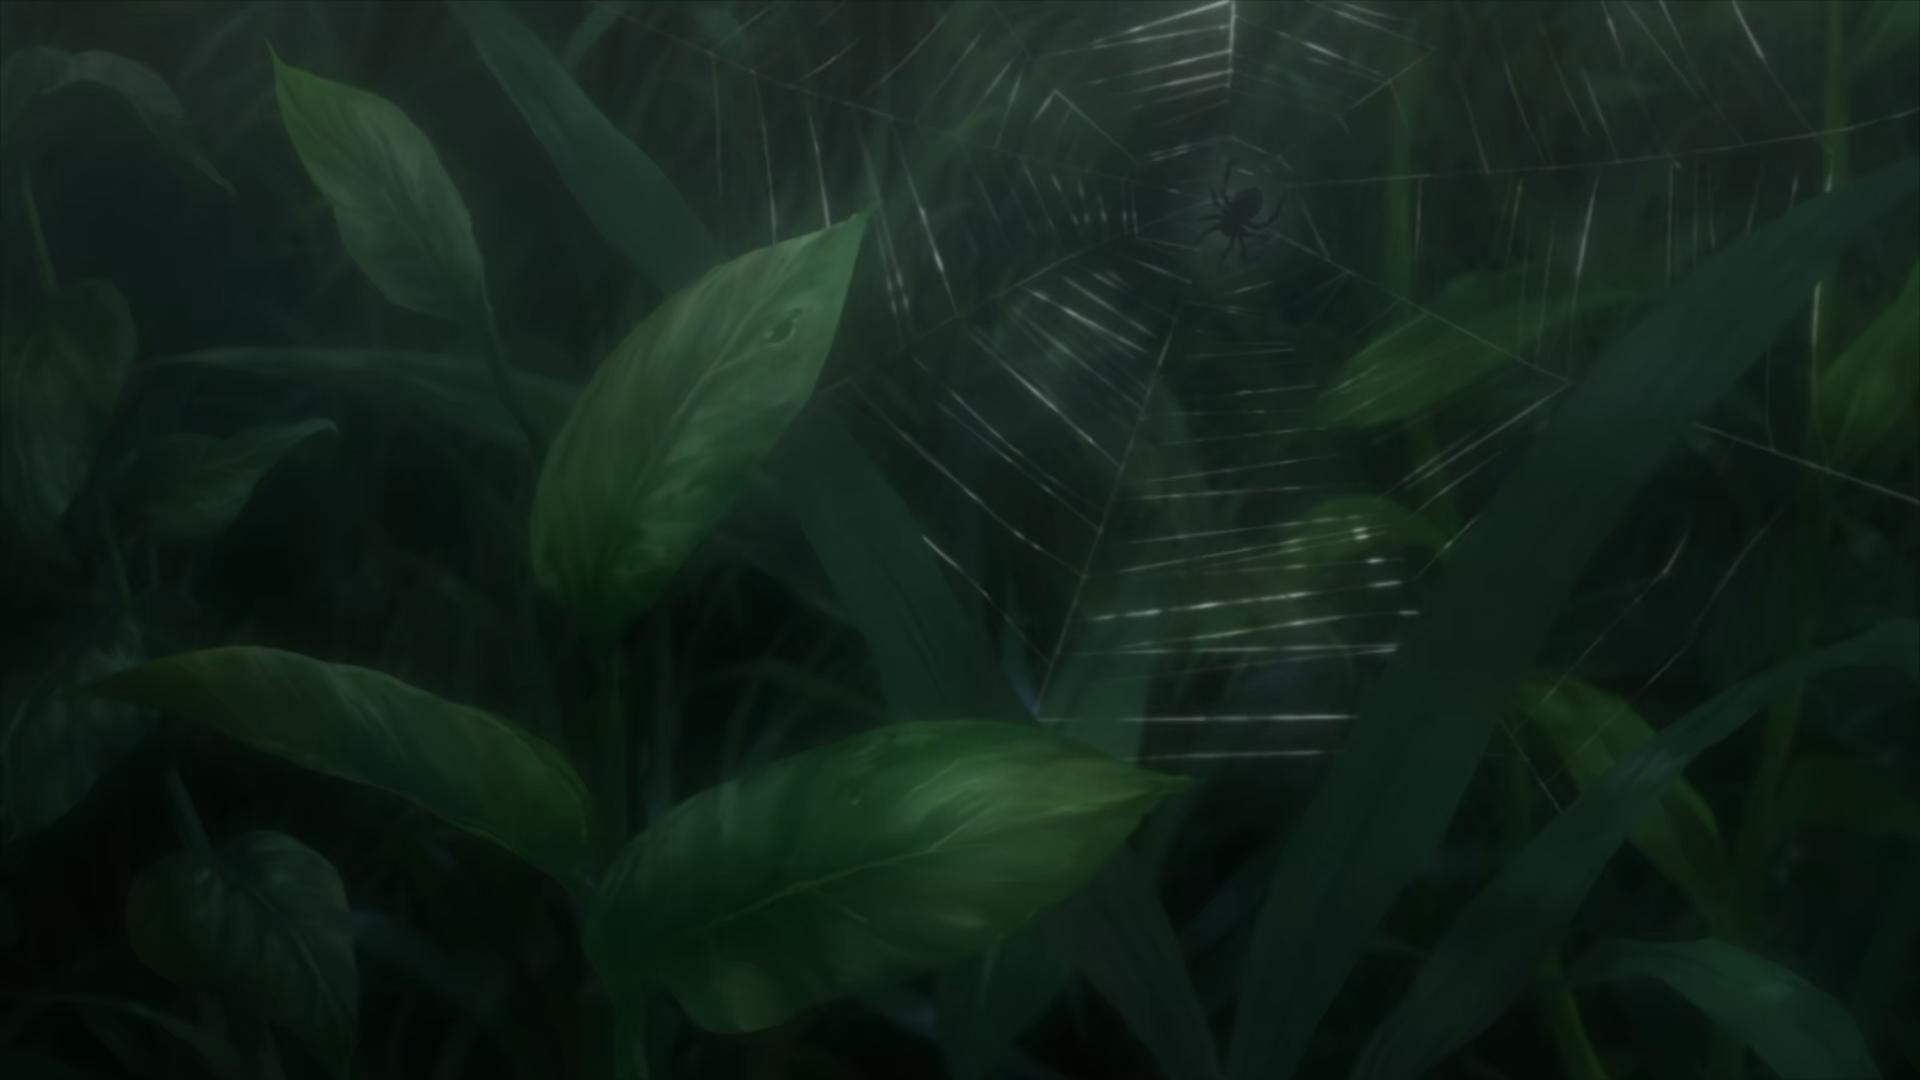 A spider web, MUSHI-SHI